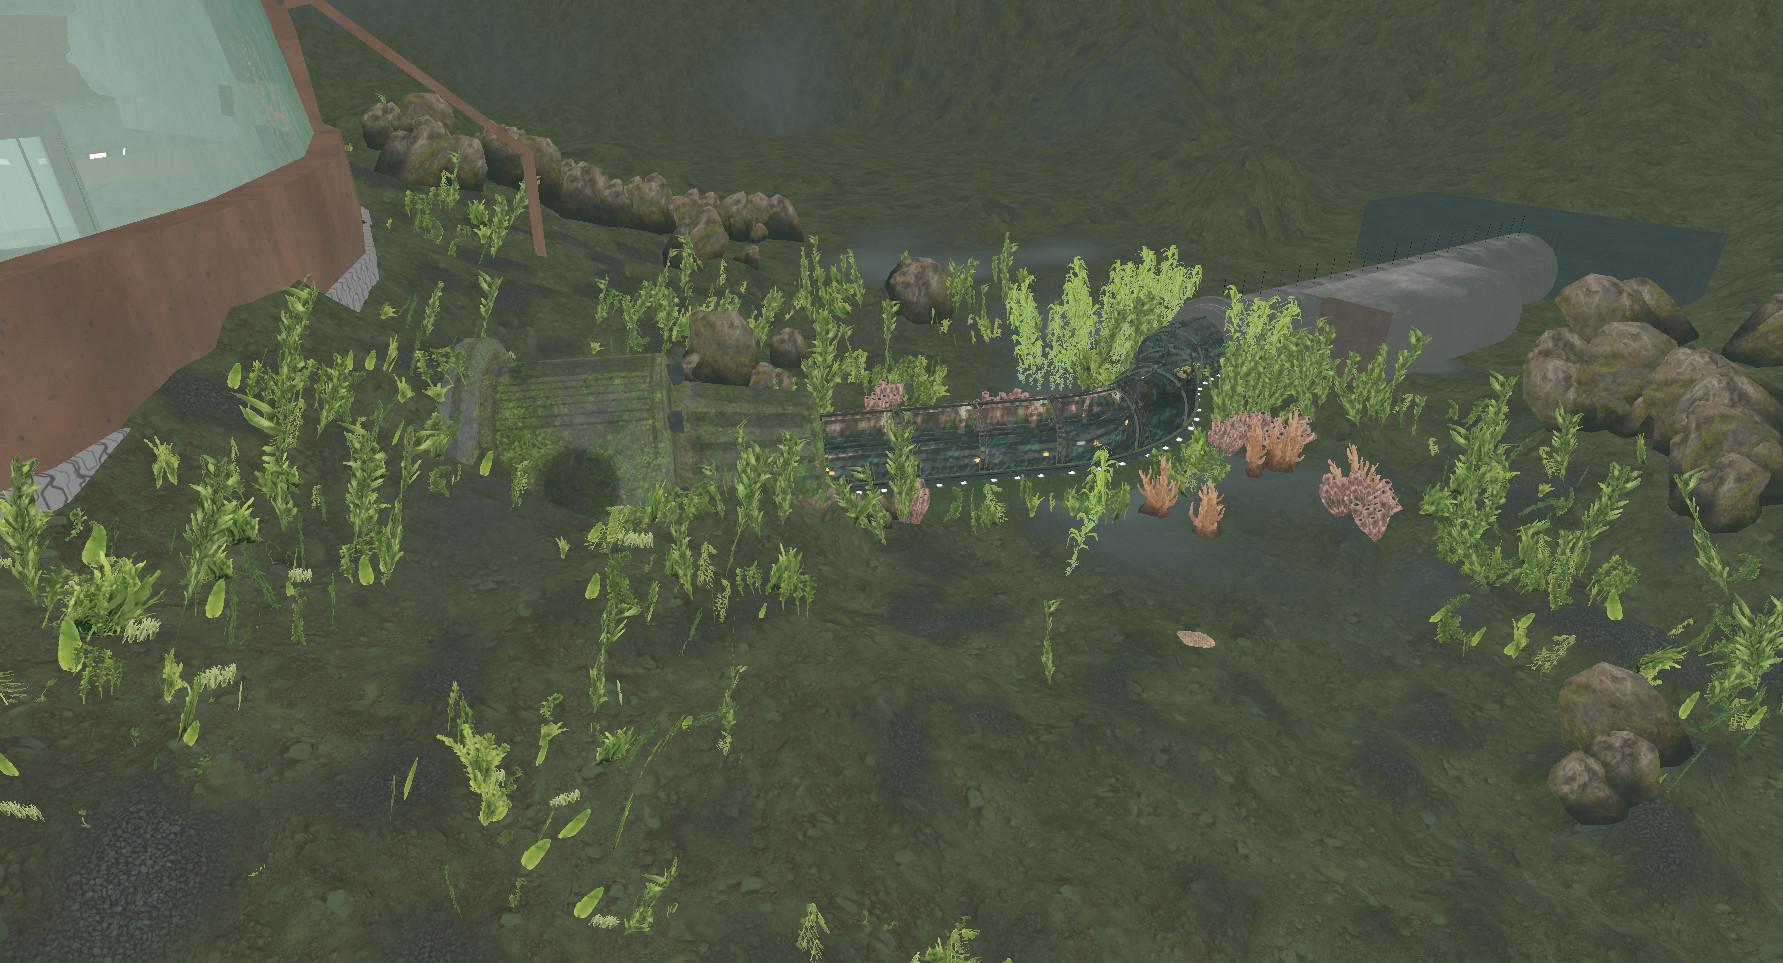 Lea kronenberger underwater 2